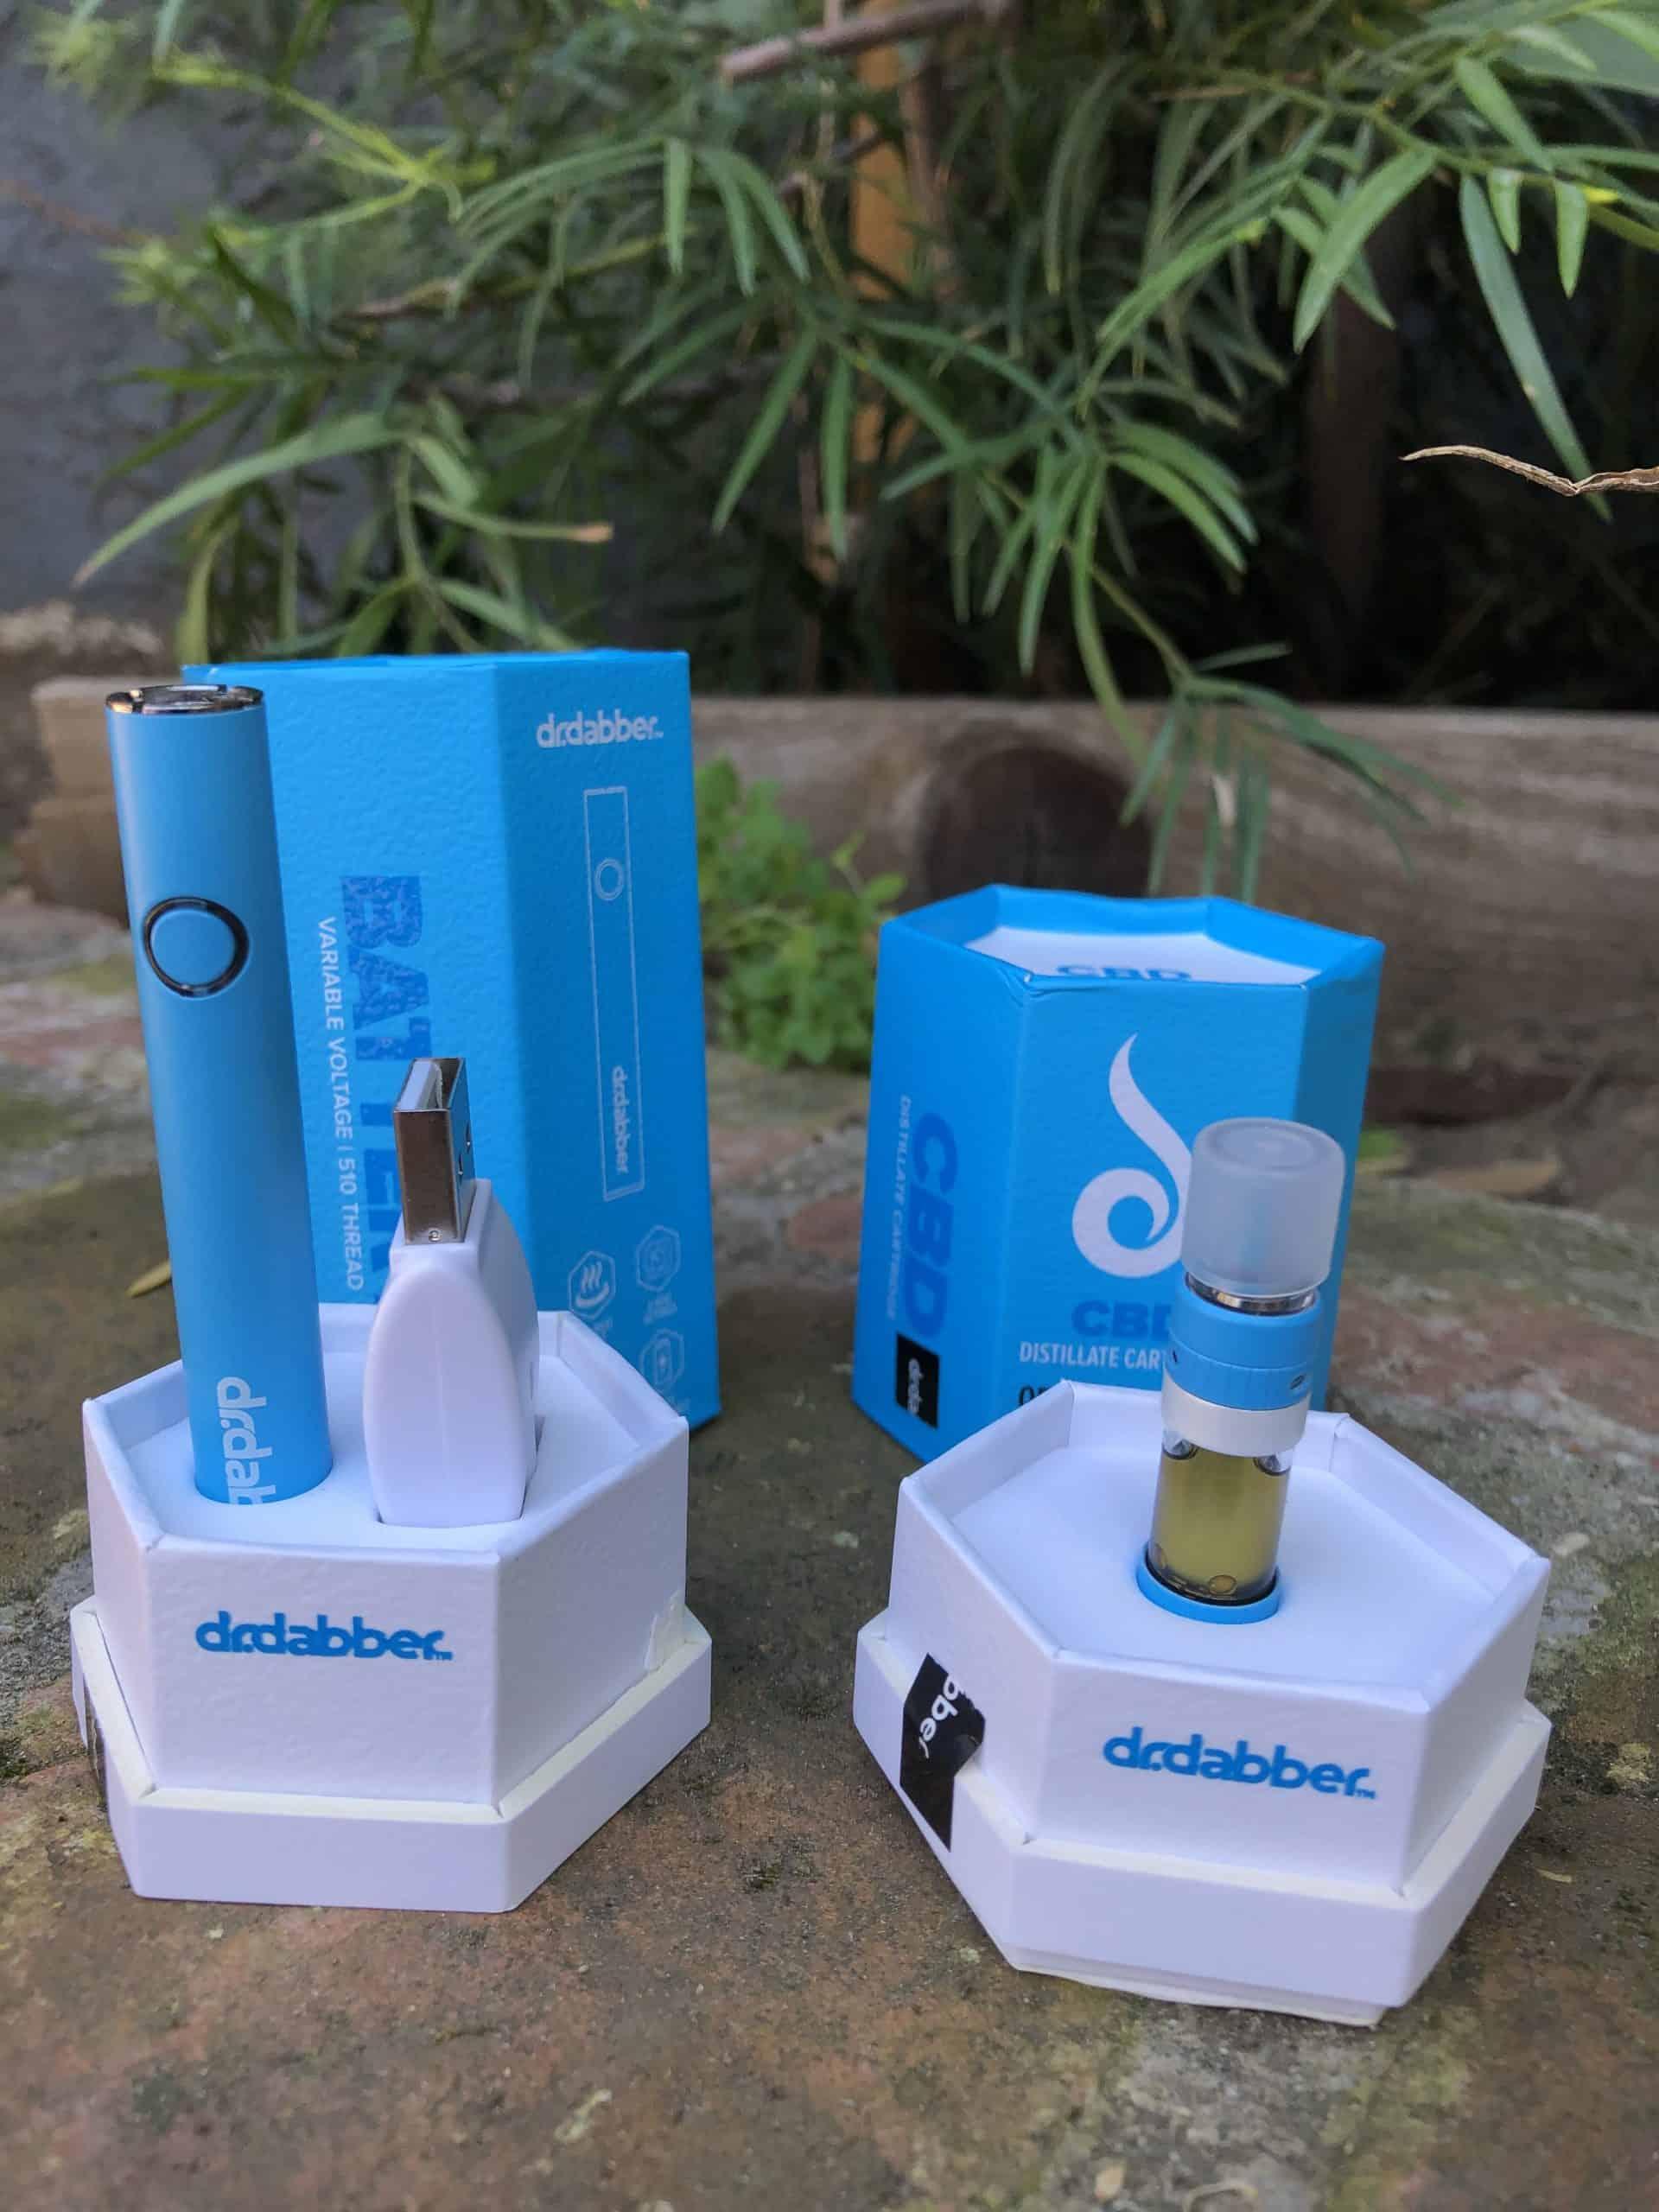 dr dabber cbd cartridge and battery combo original blend save on cannabis beauty shot